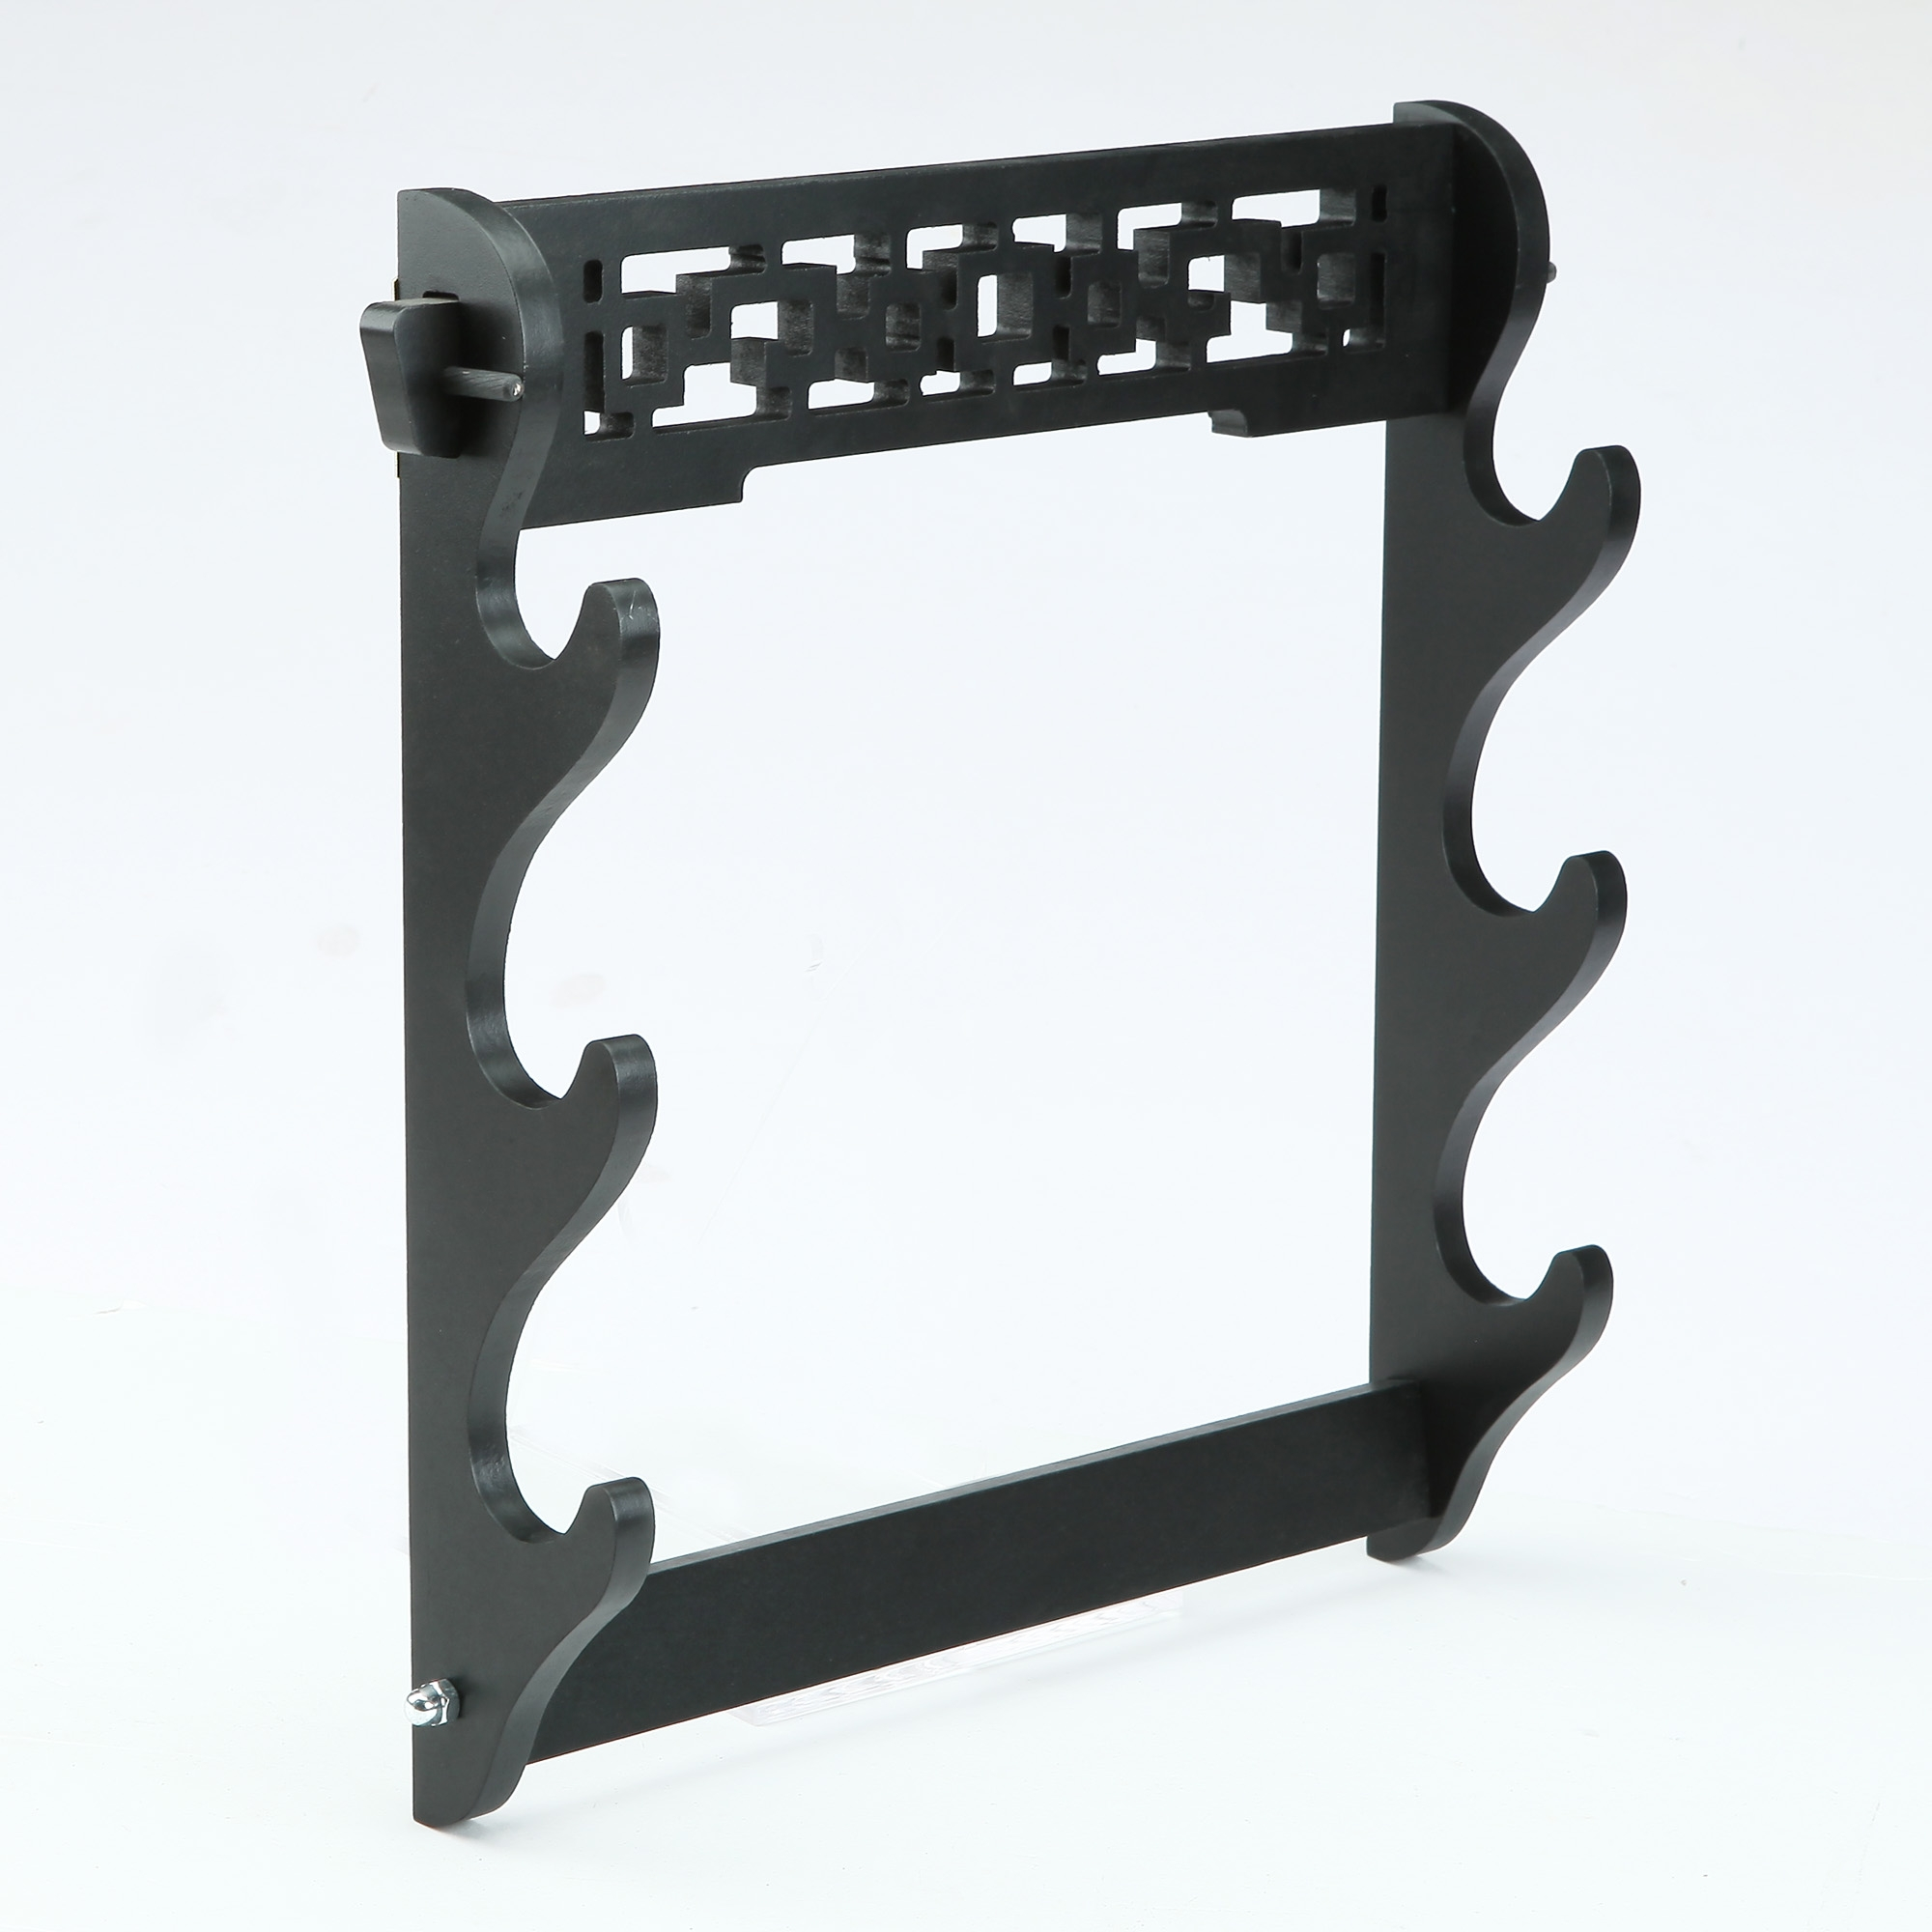 Handmade Black Wooden 3 Tier Katana Sword Stand Holder Display Rack Stand Wall Mount